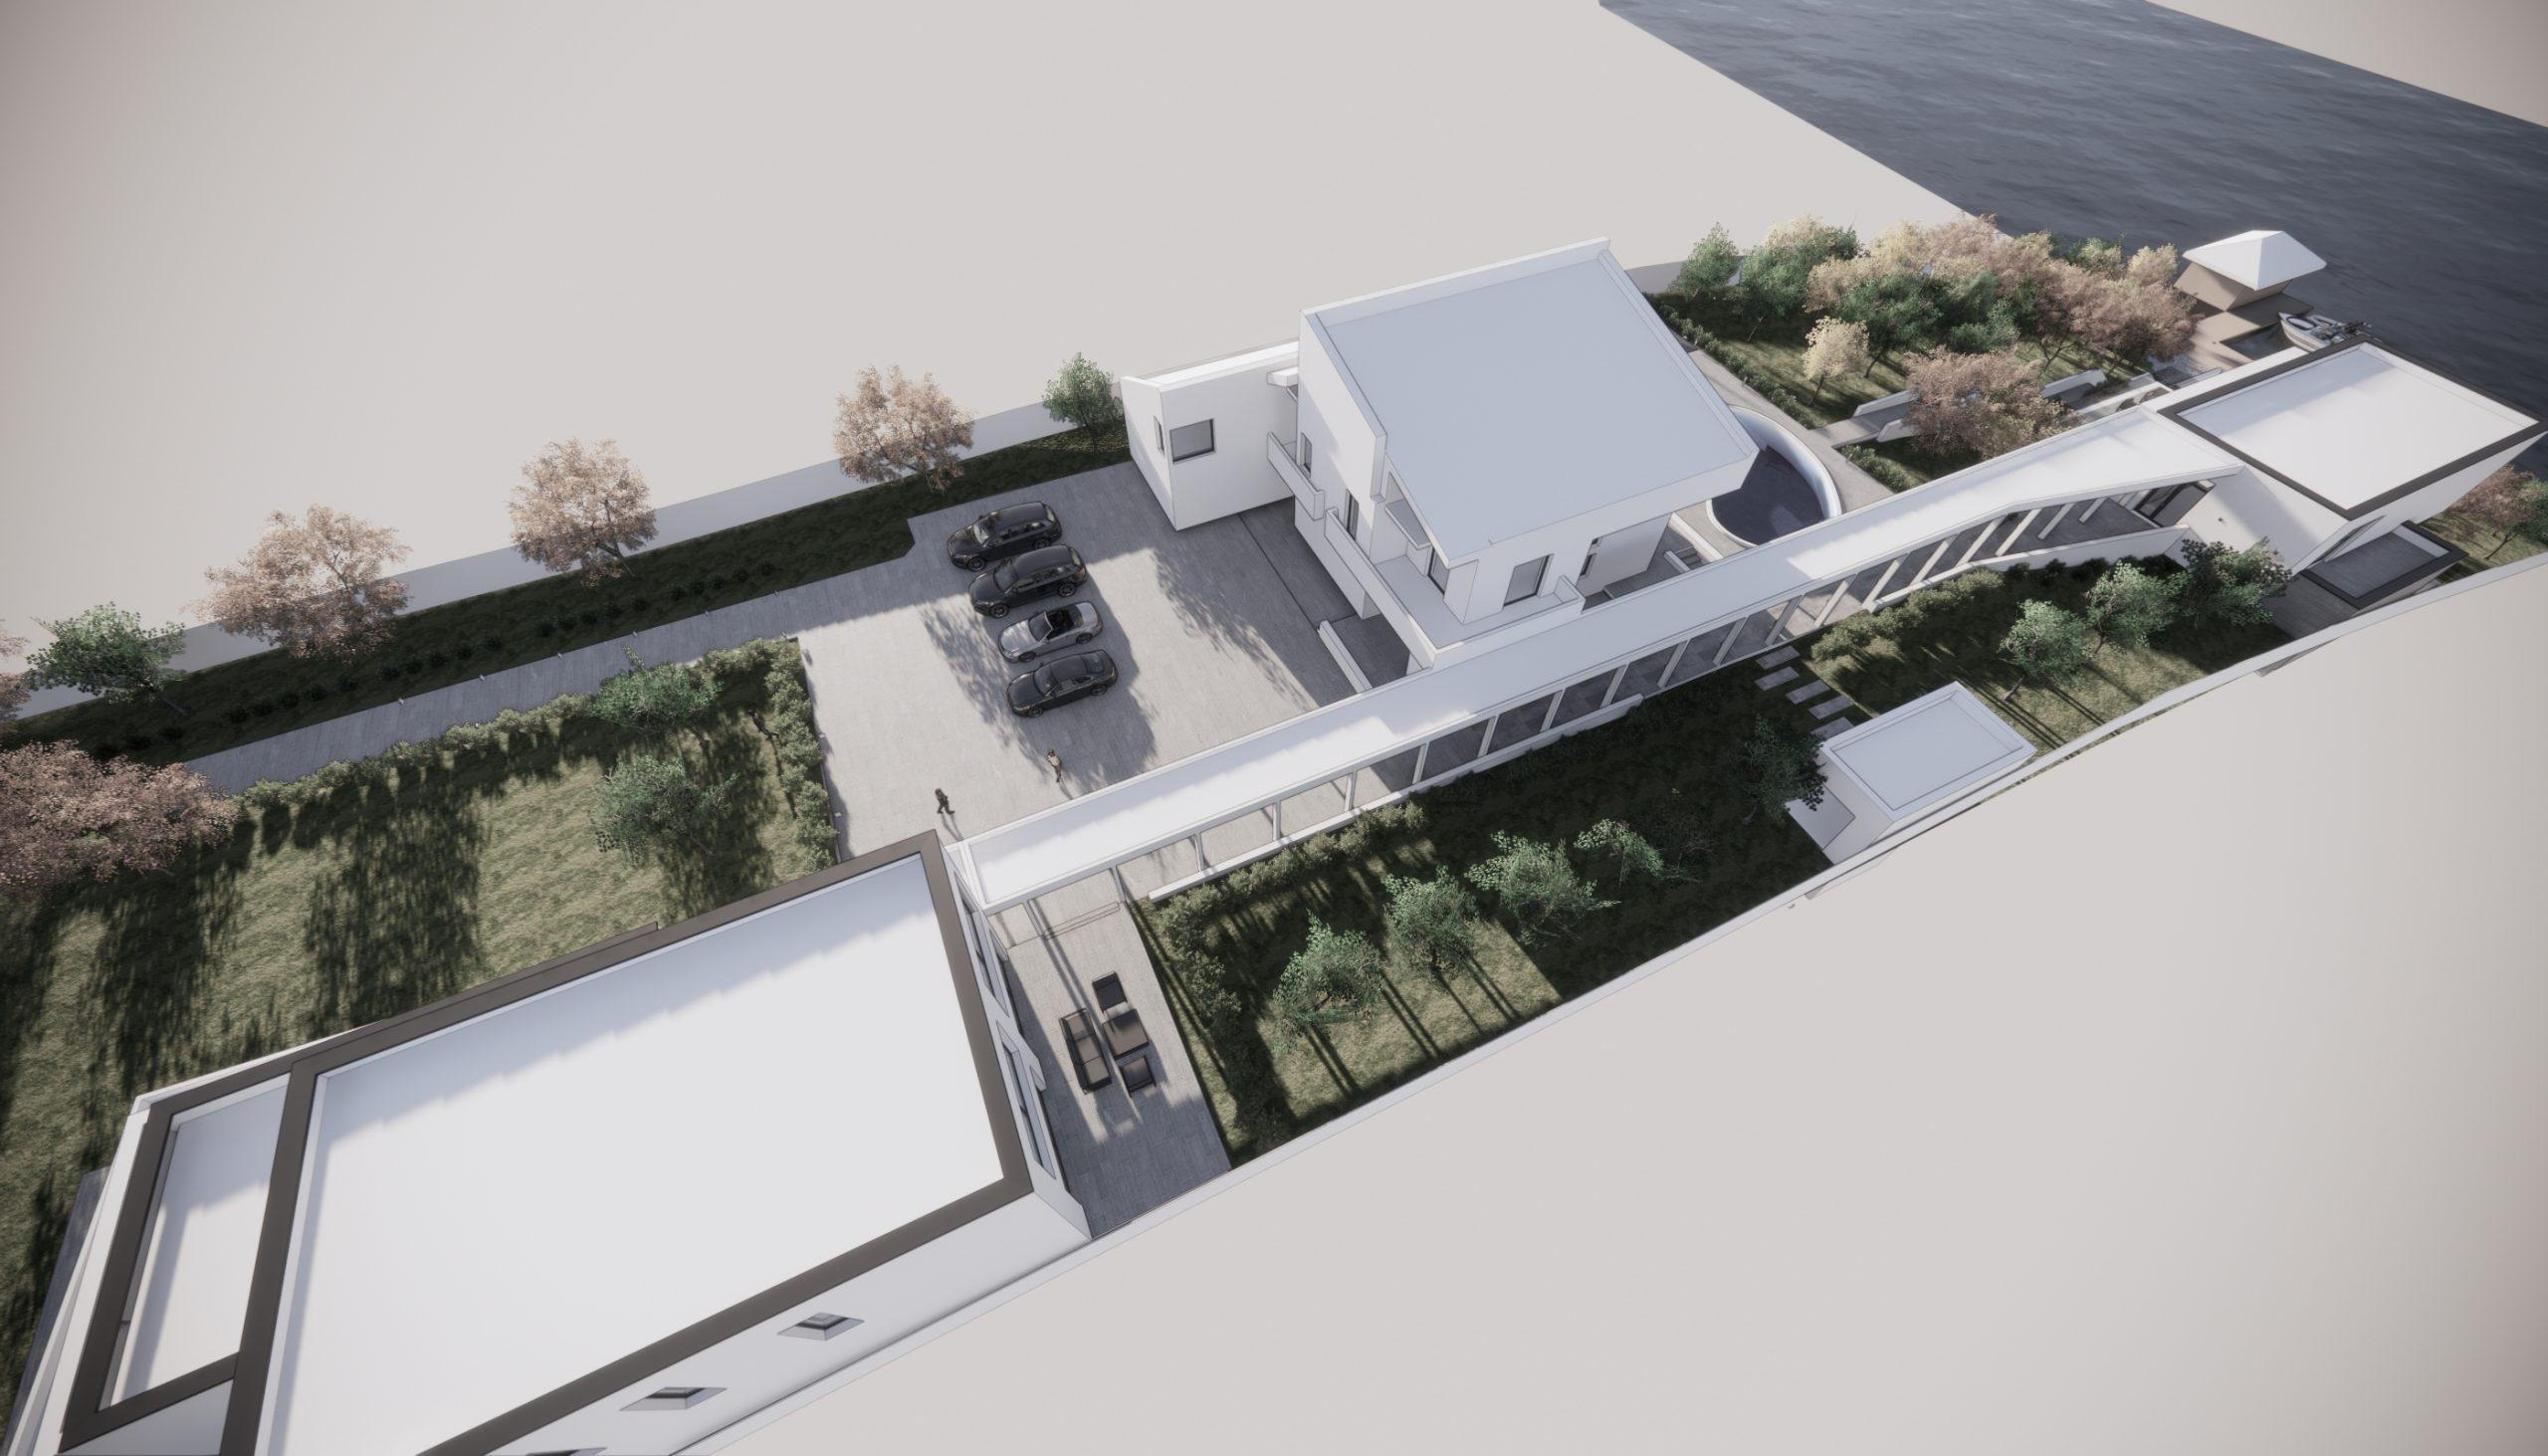 https://nbc-arhitect.ro/wp-content/uploads/2020/11/NBC-Arhitect-_-residential-_-2x-Snagov-_-Snagov-Romania_13-scaled.jpg